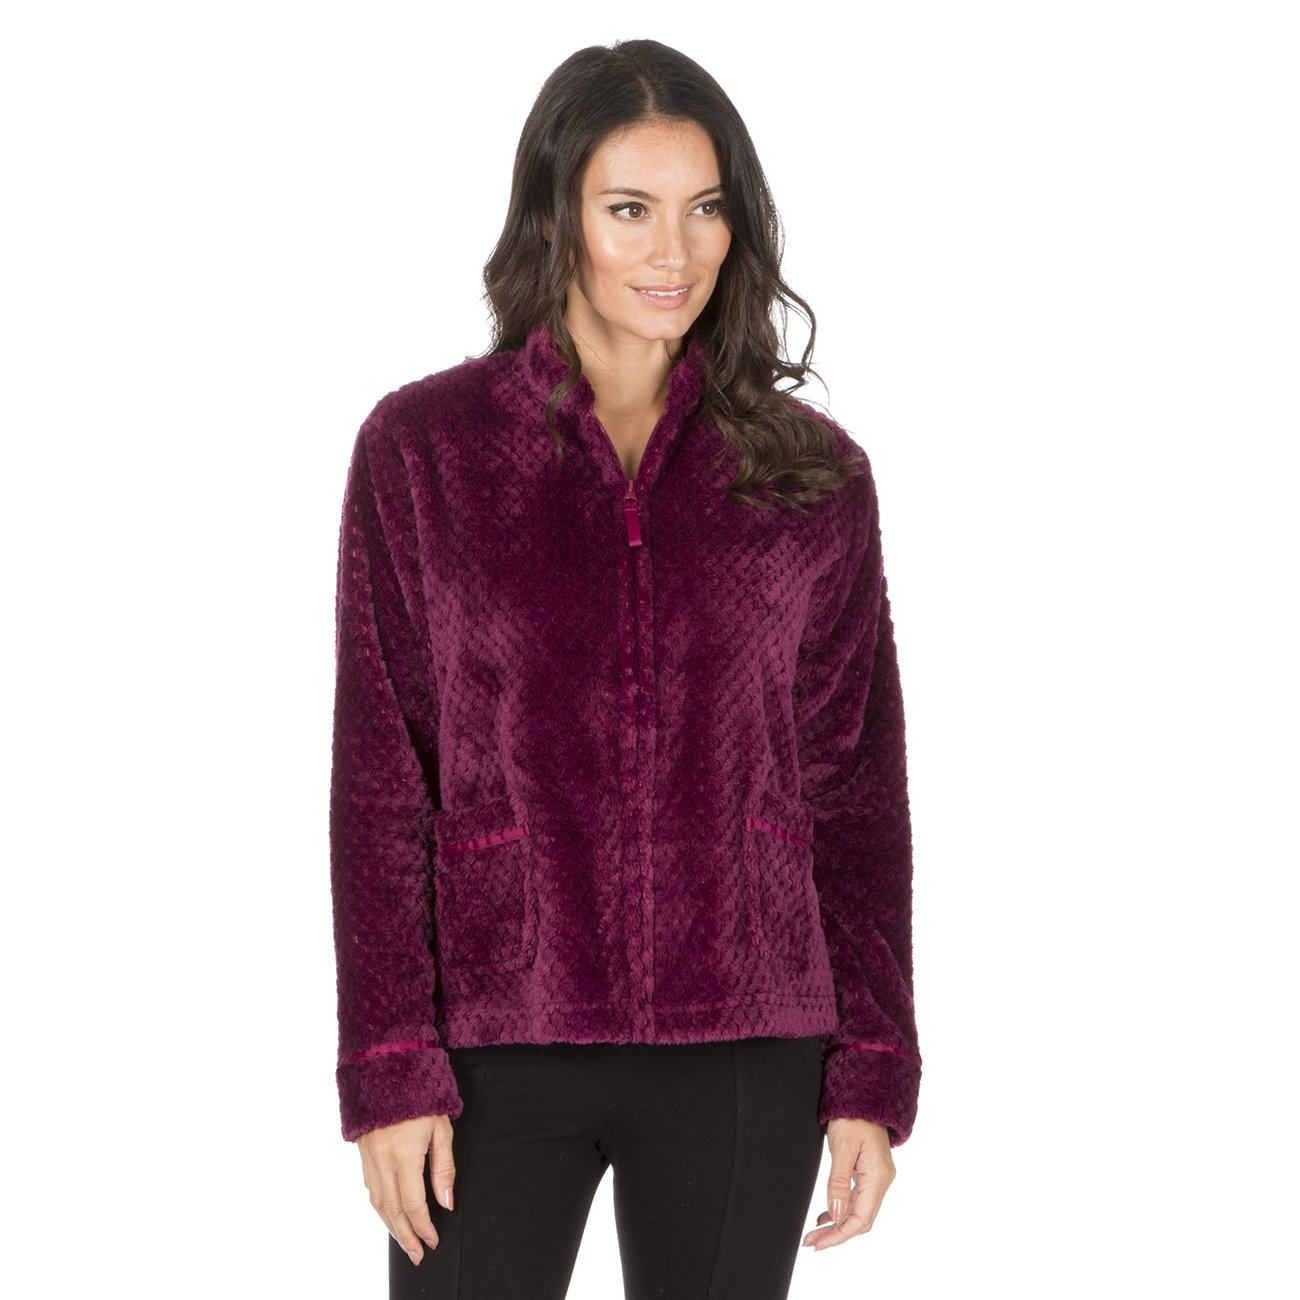 Forever Dreaming Womens Waffle Fleece Bed Jacket - Zip Up Luxury Pyjama Lounge Top